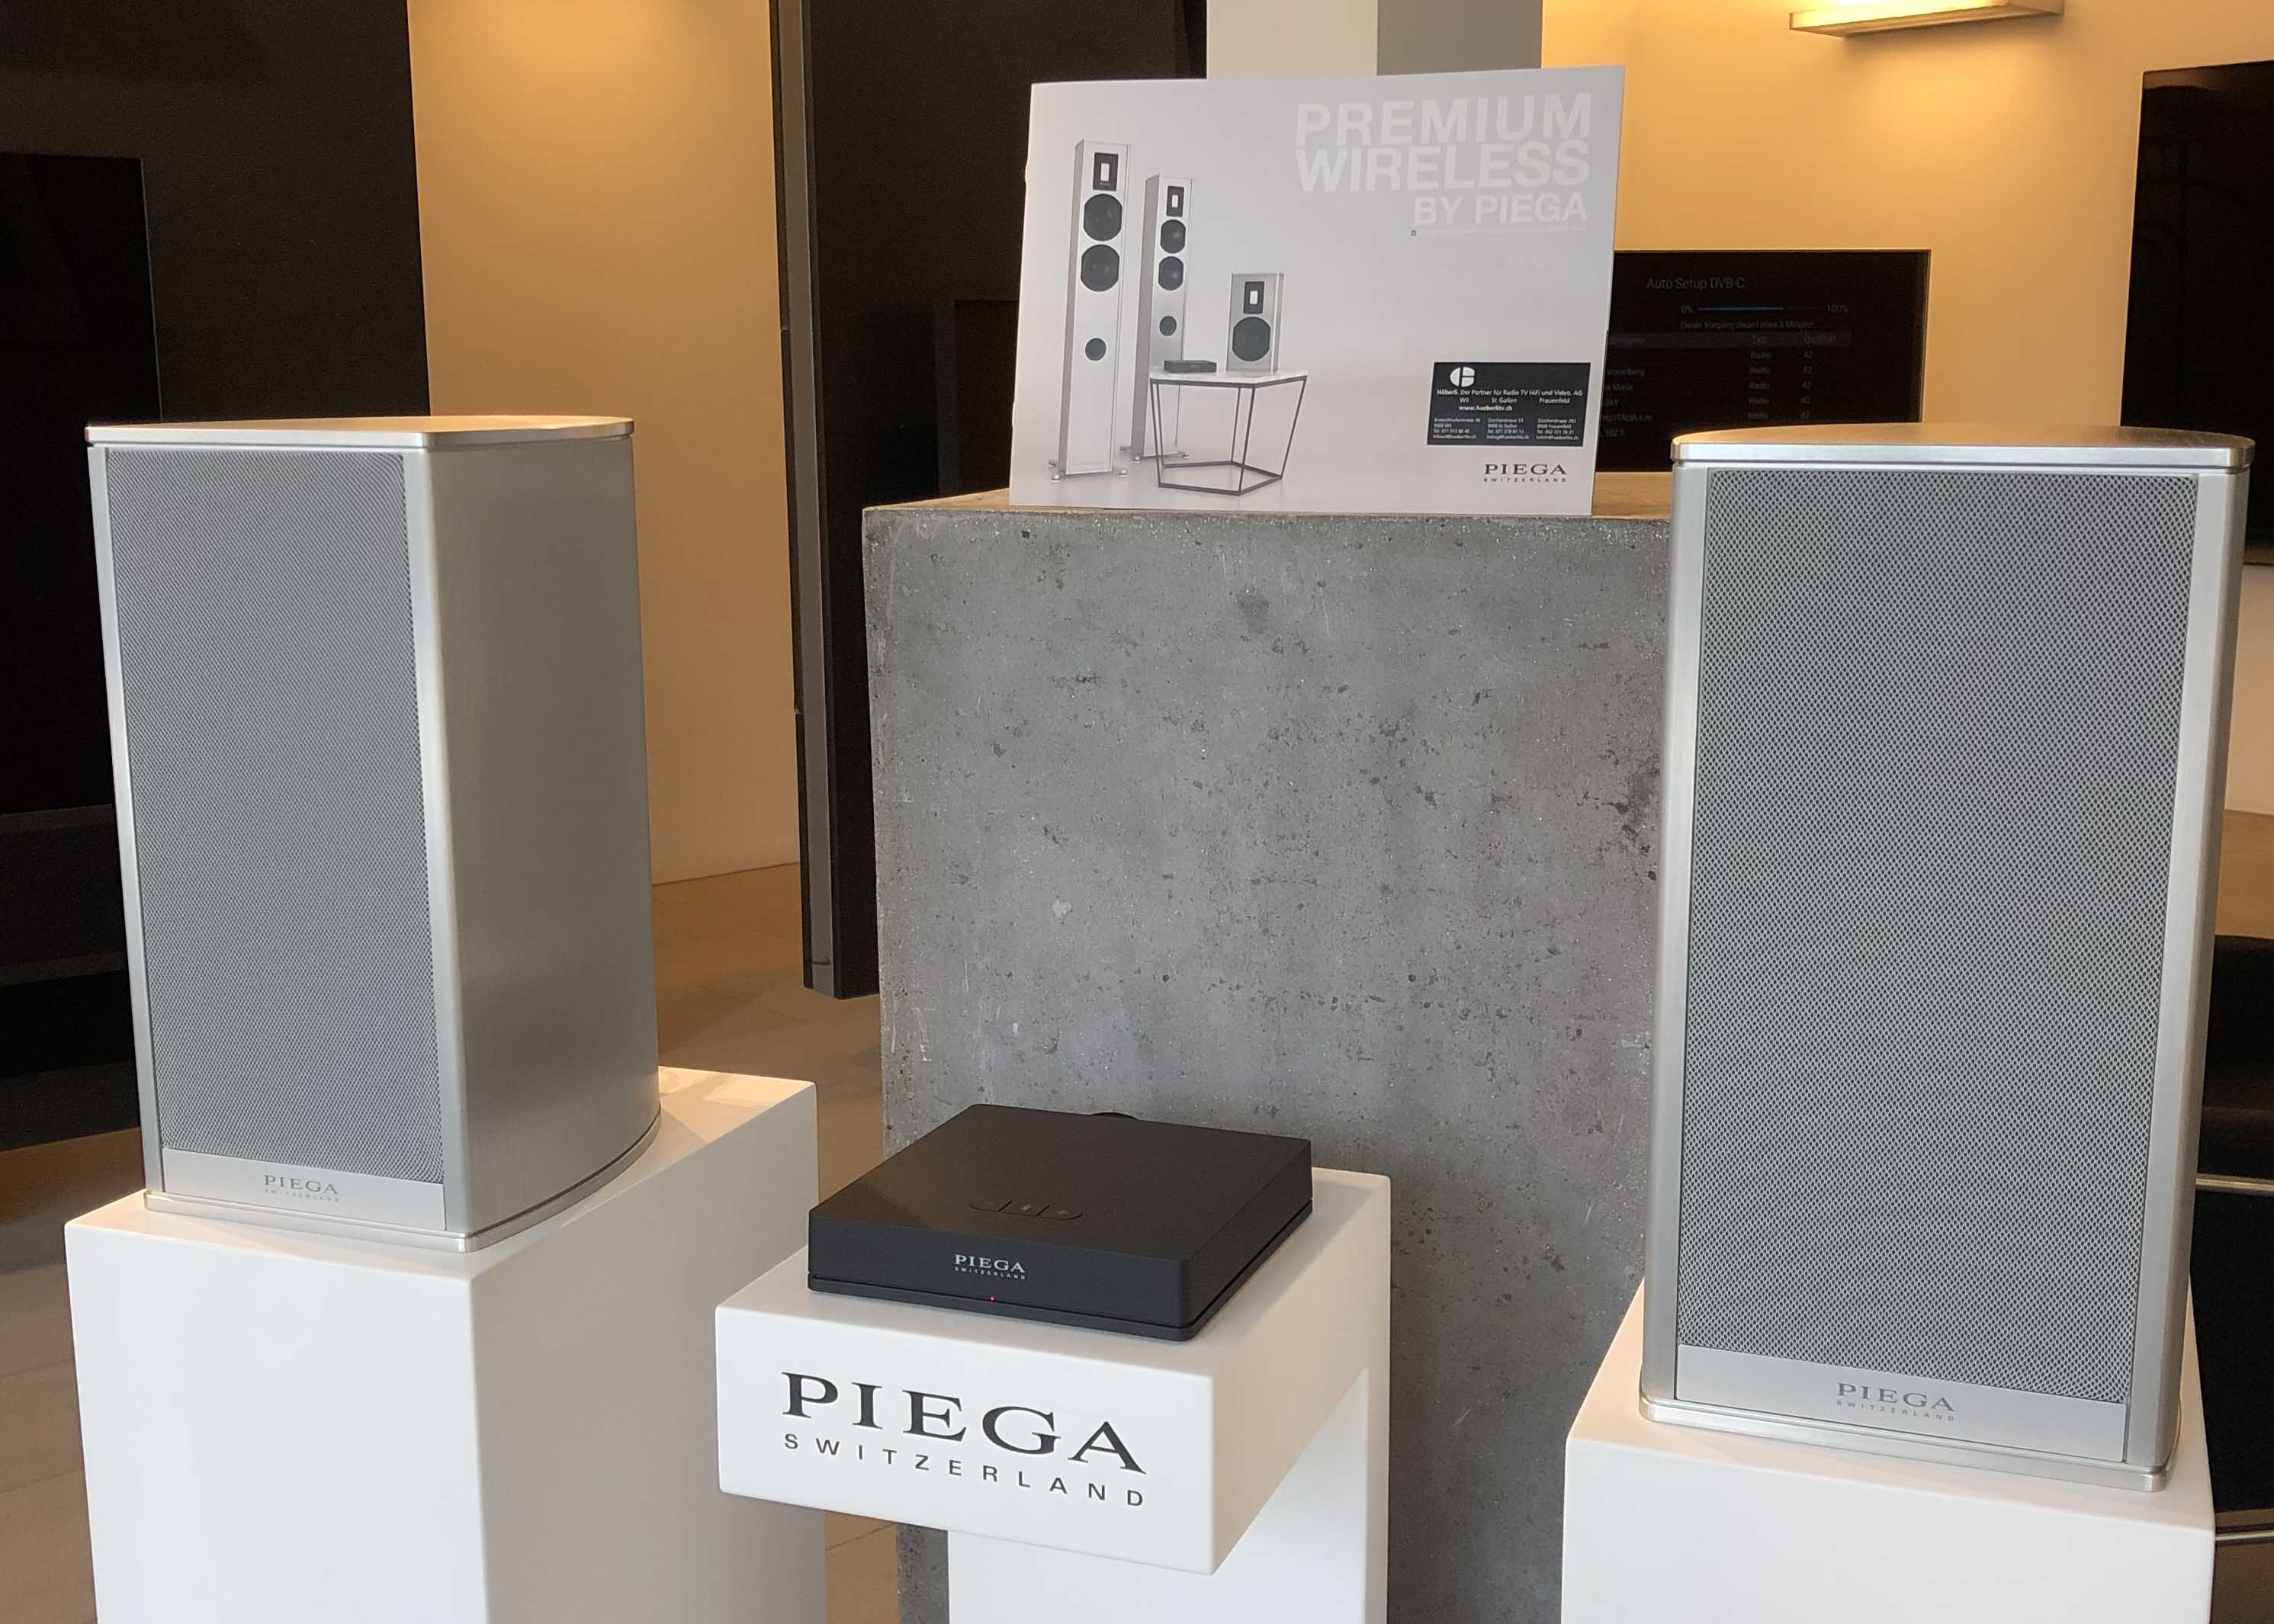 Piega Premium Wireless